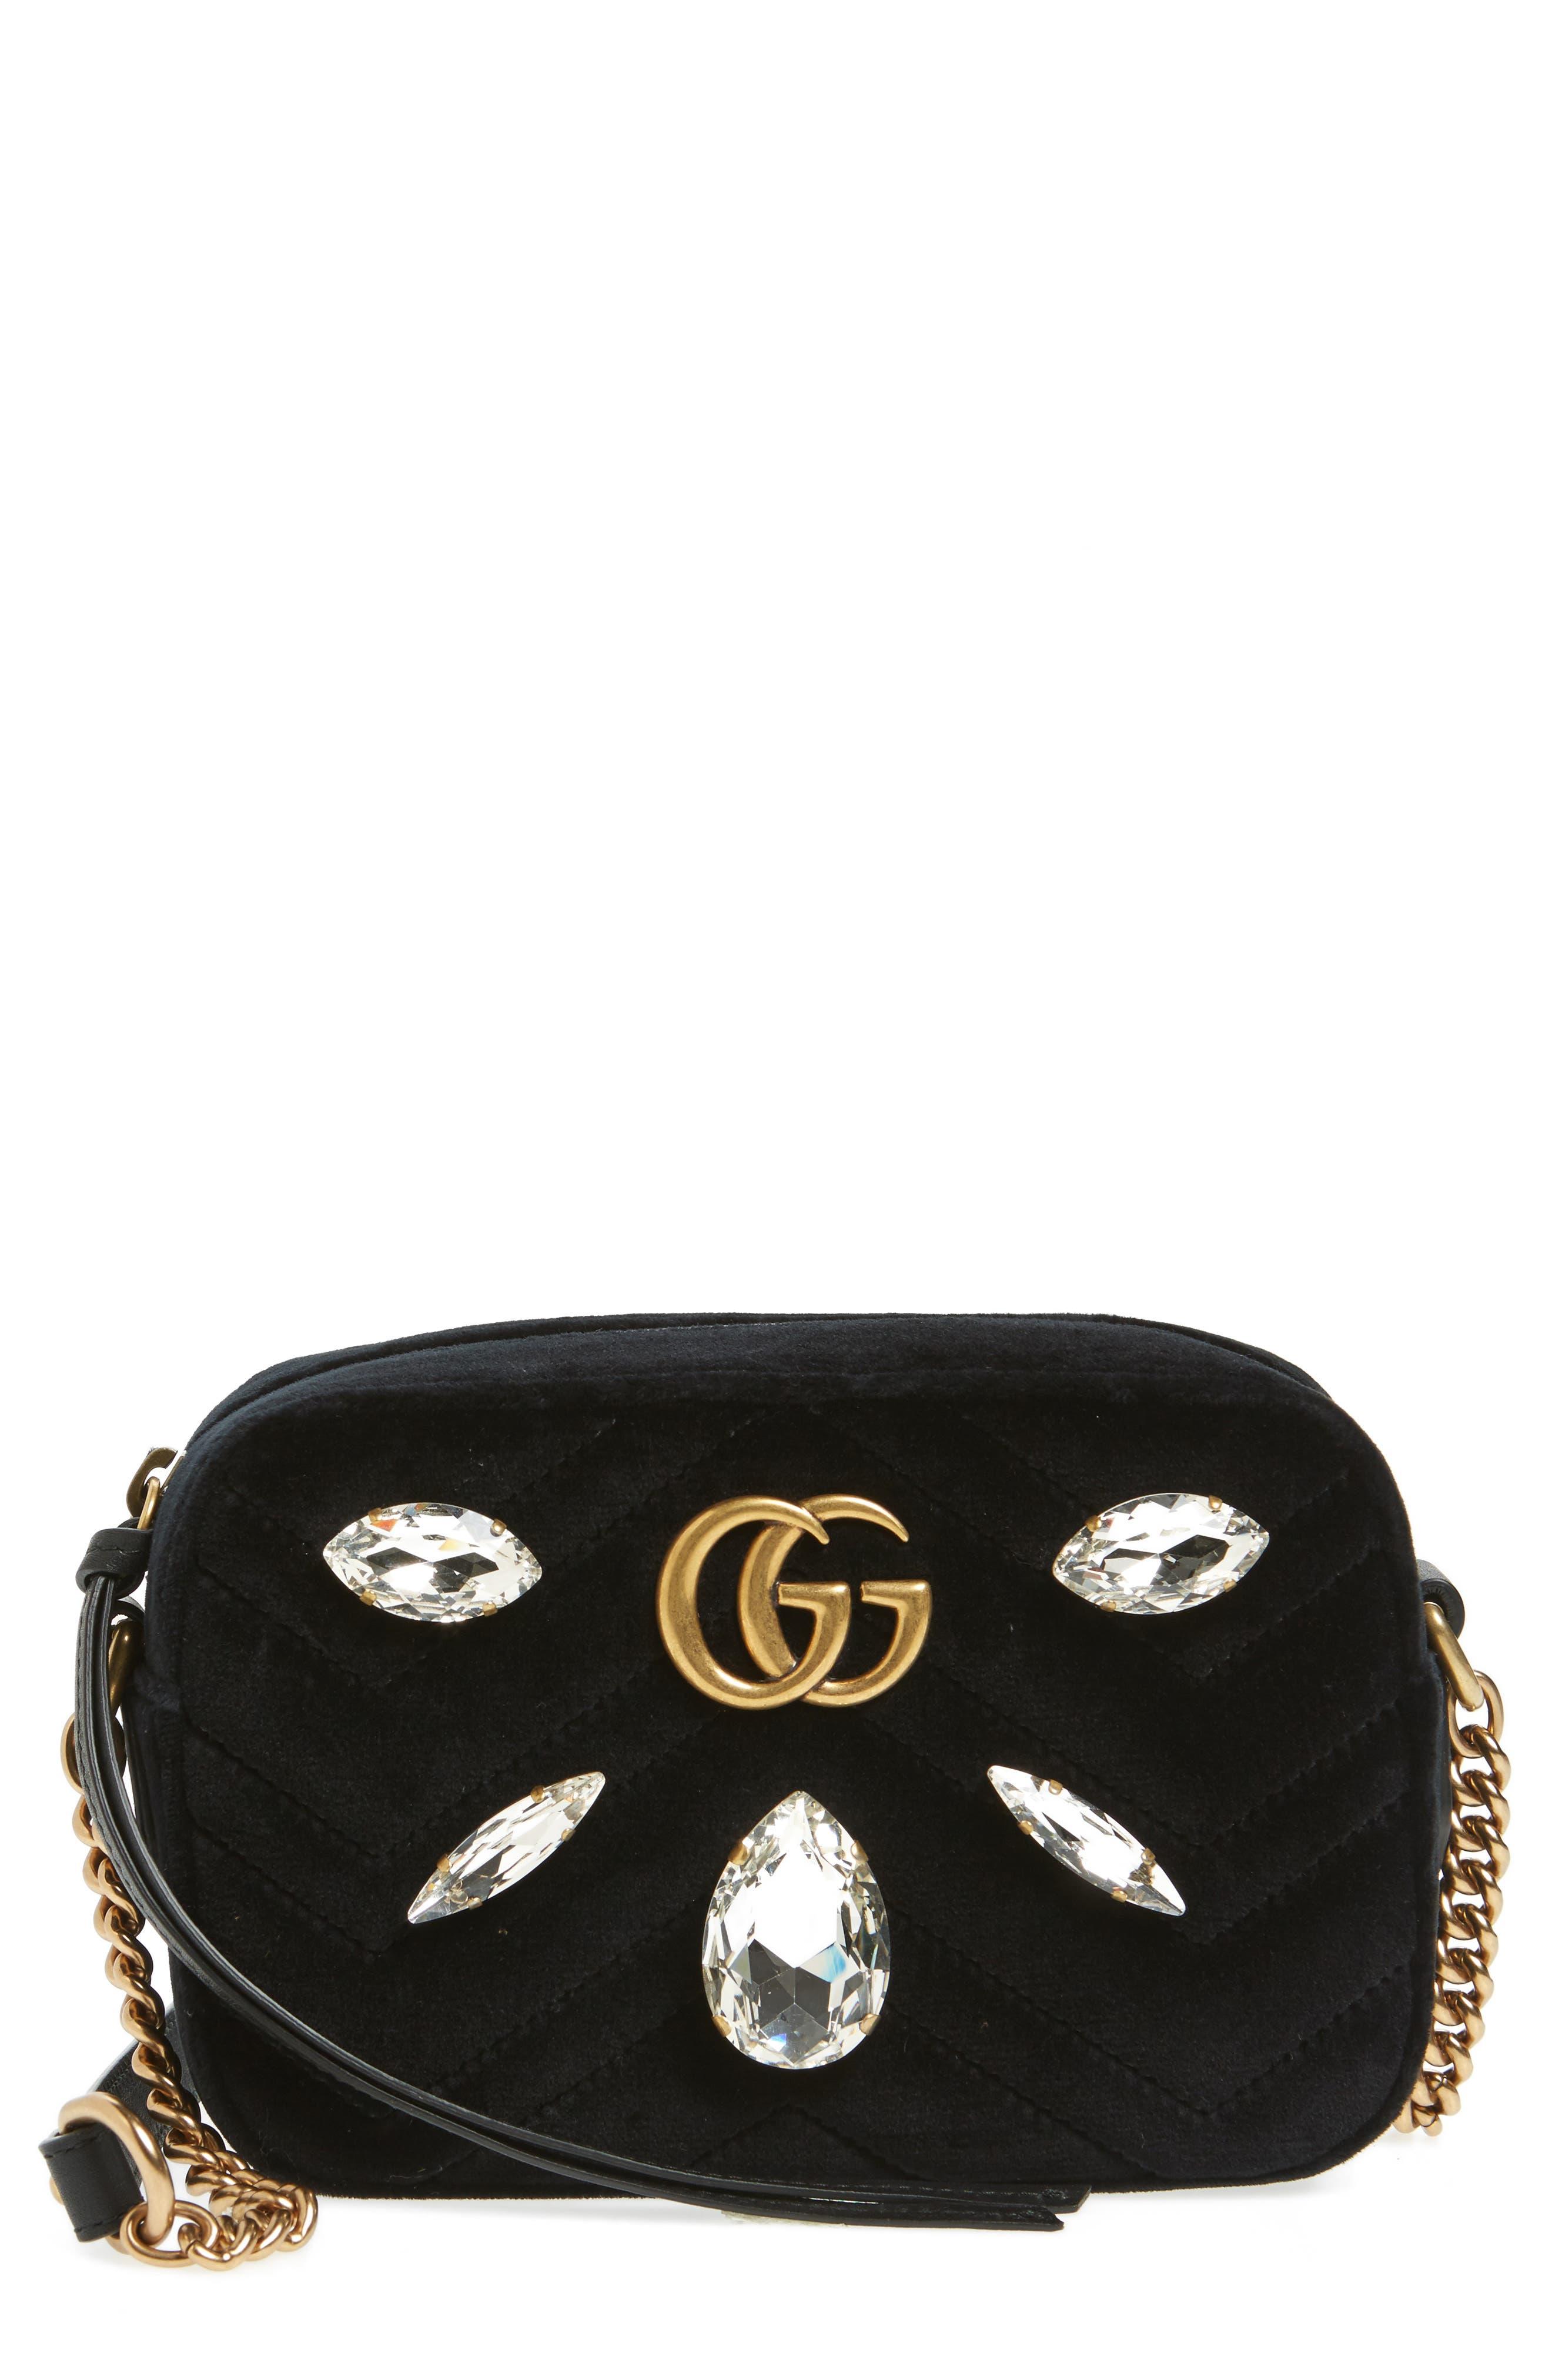 GG Marmont Crystal Matelassé Quilted Velvet Crossbody Bag,                         Main,                         color, 001